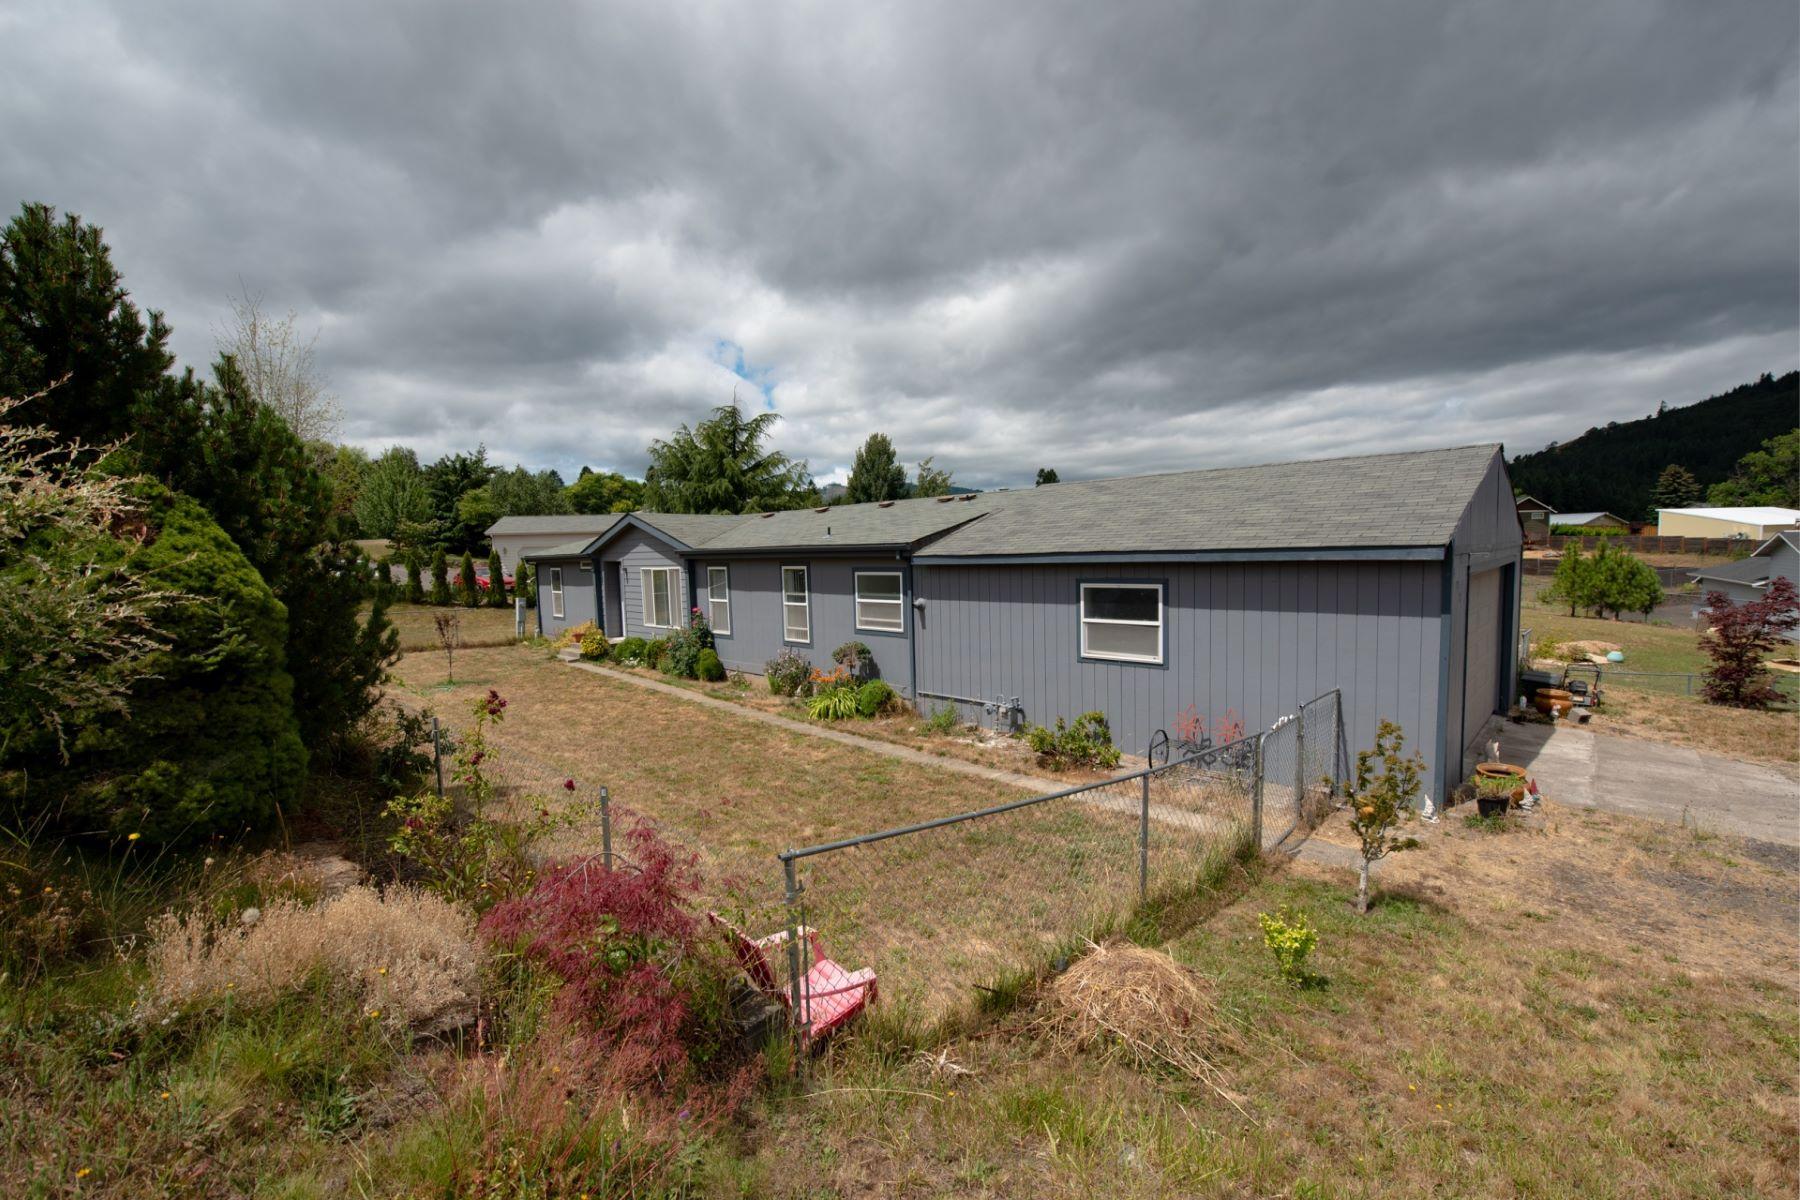 Single Family Homes for Sale at 537 Cochran Lane White Salmon, Washington 98672 United States